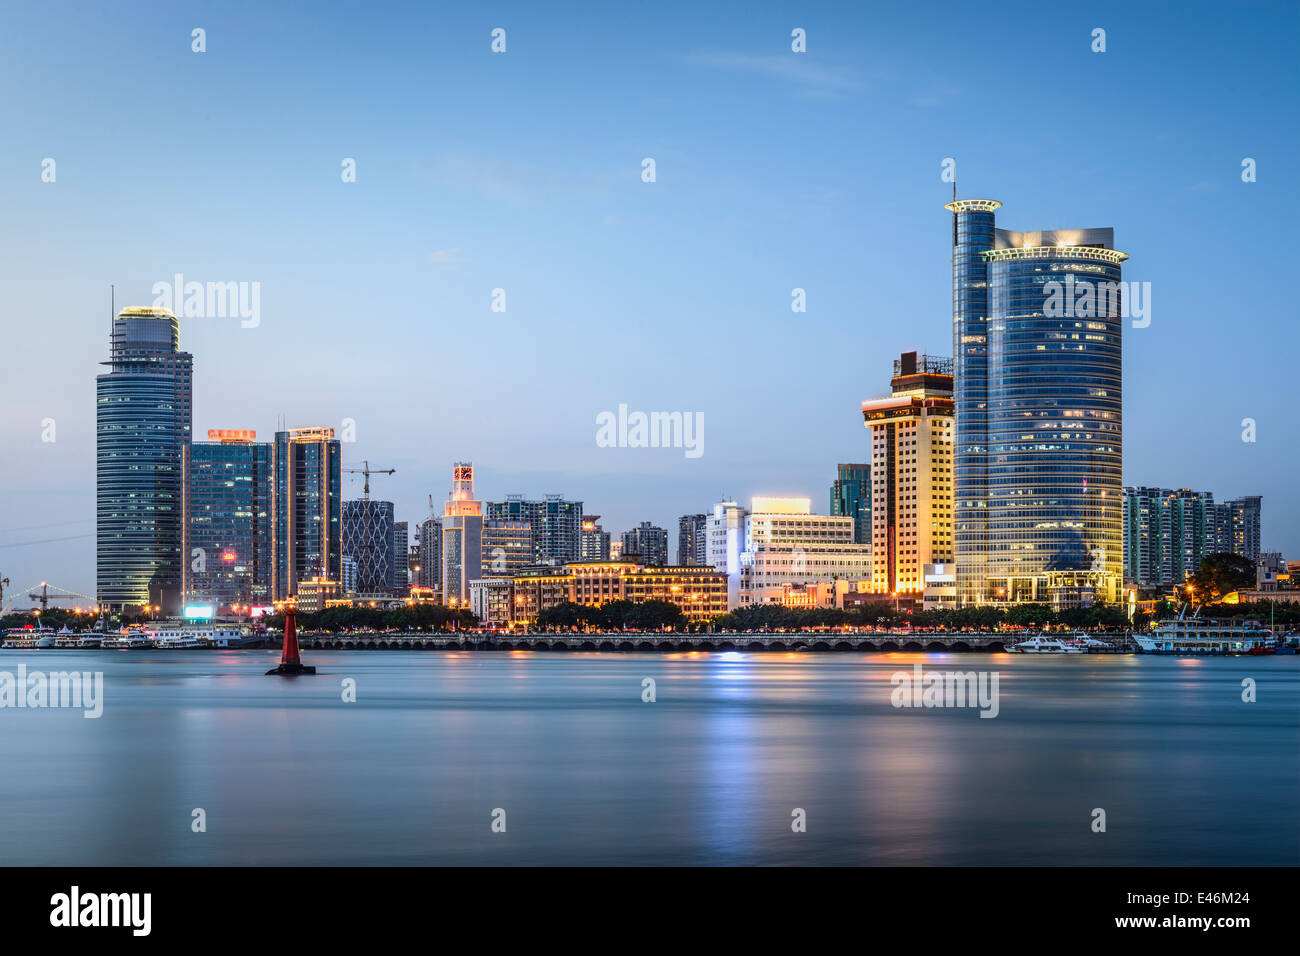 Xiamen, China skyline at twilight. - Stock Image